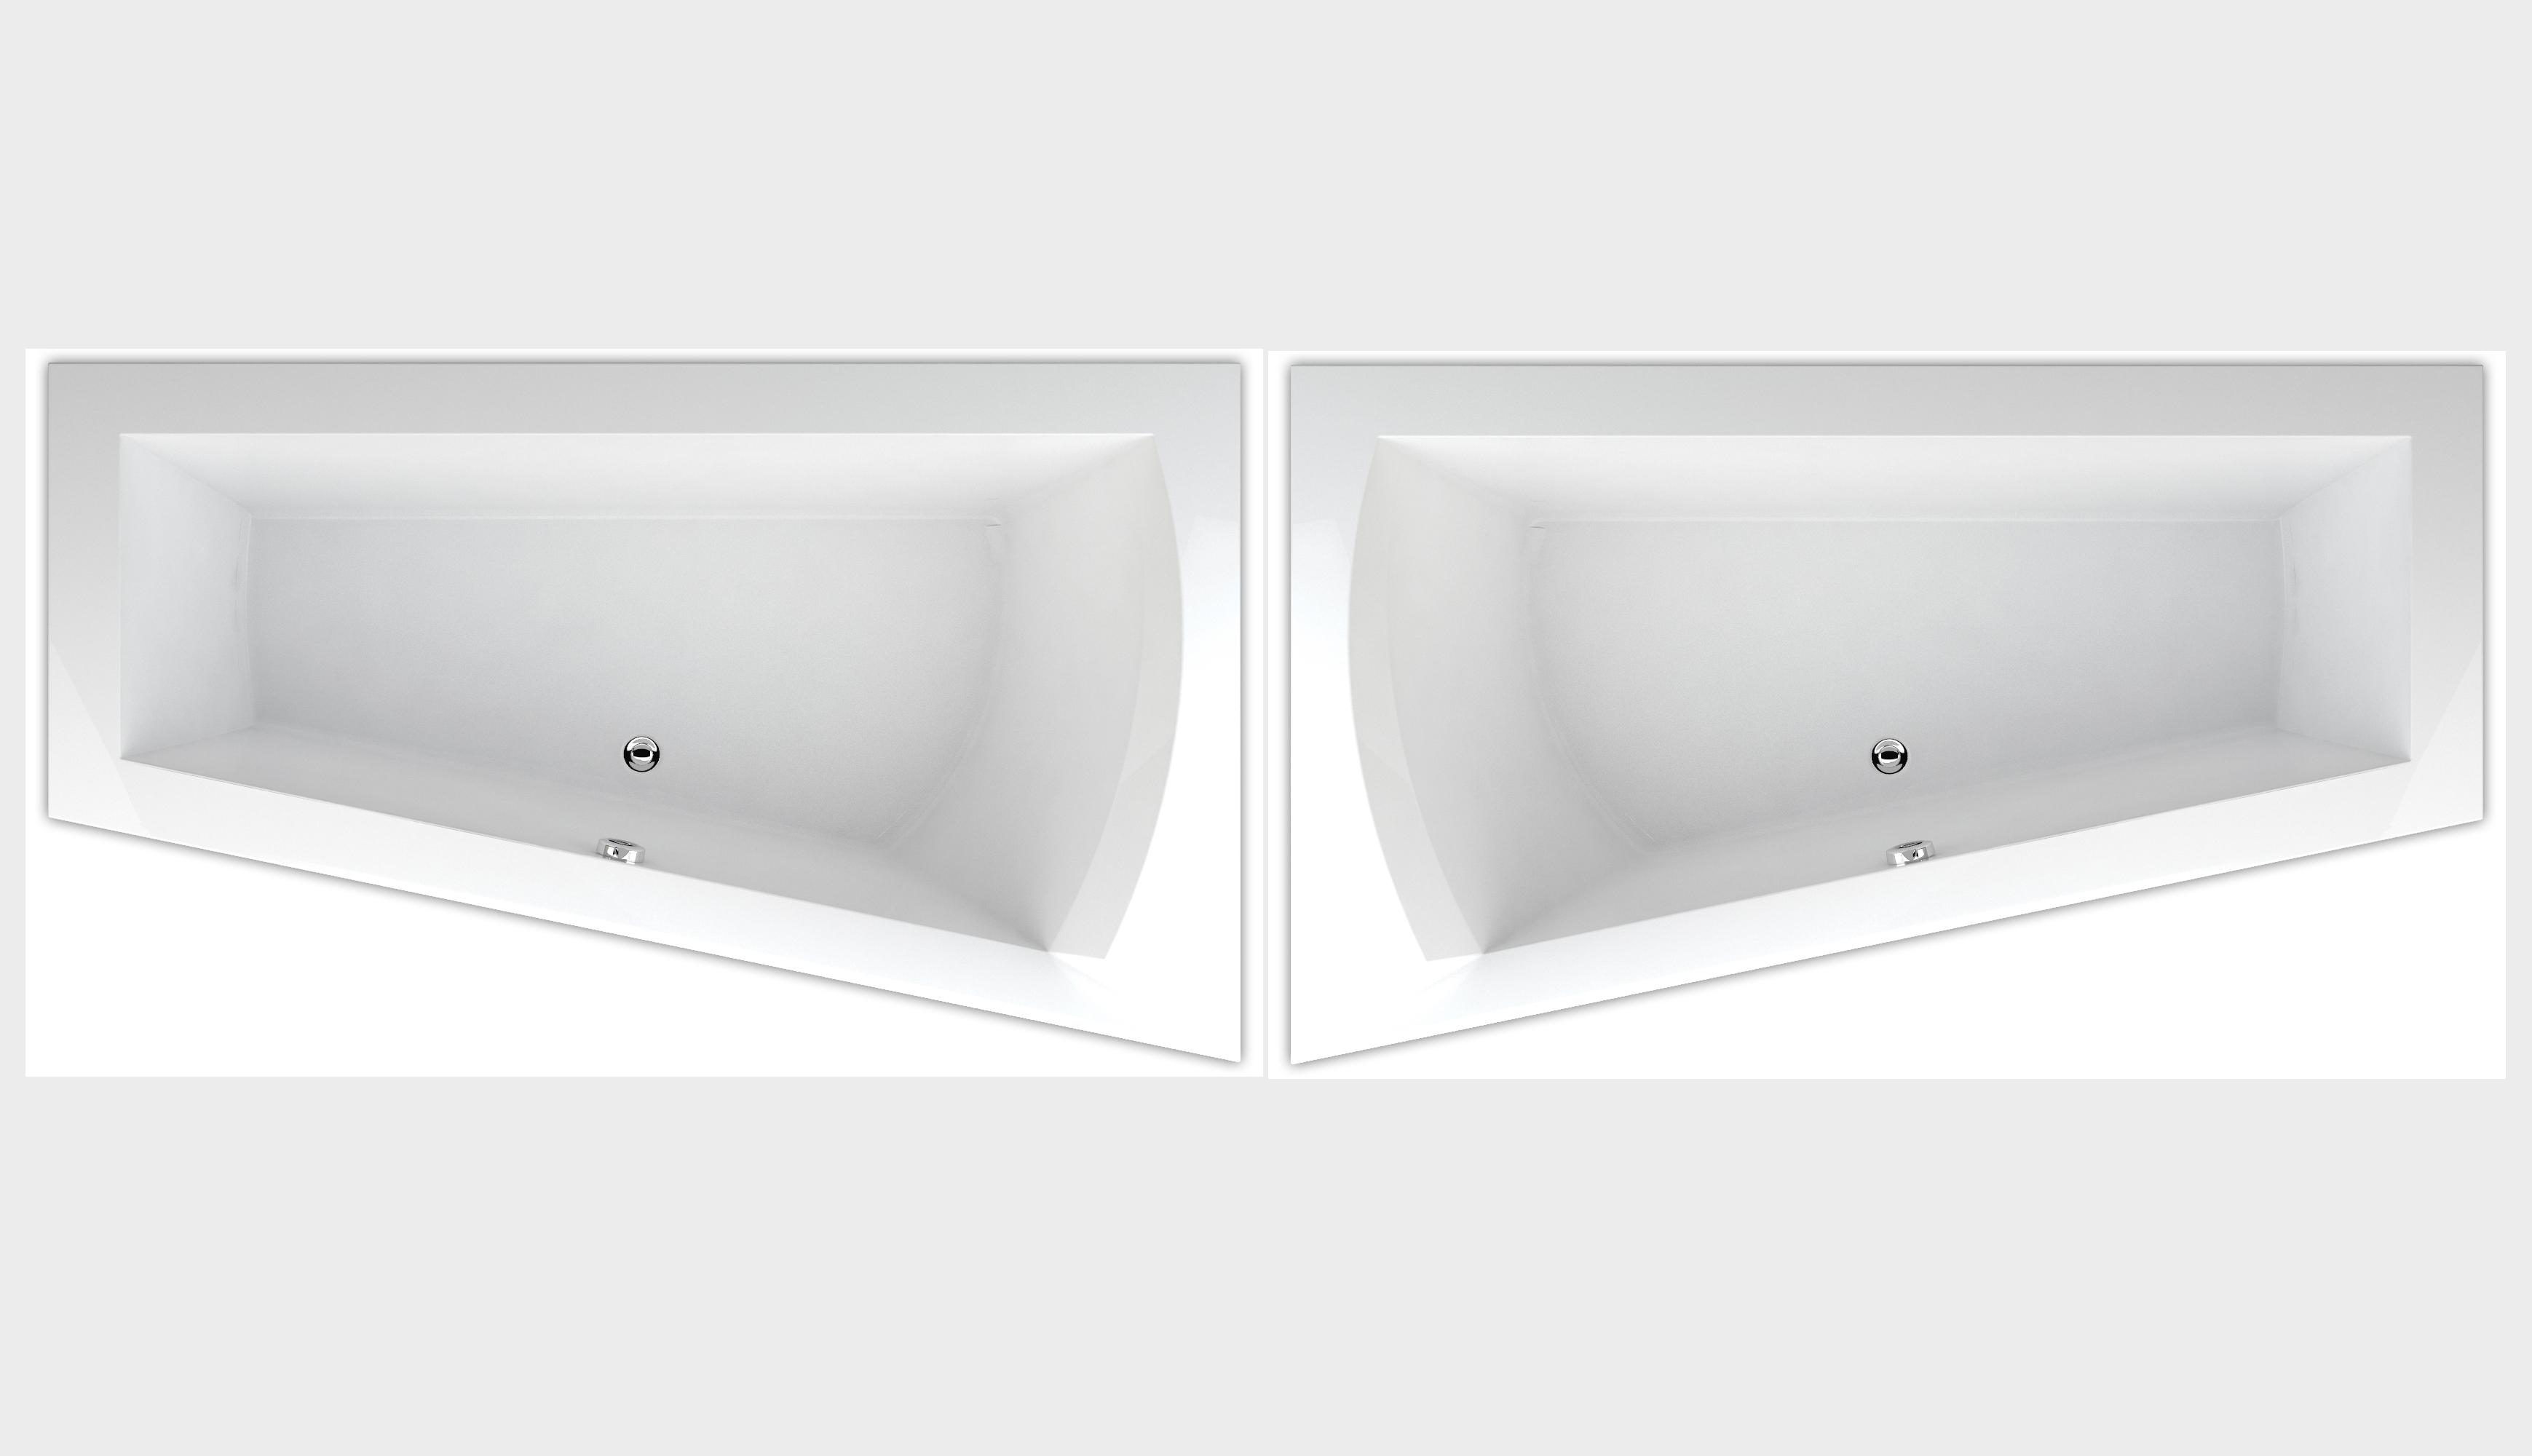 raumspar badewanne galia i 170 x 100 x 50 cm rechts links ab 369 ebay. Black Bedroom Furniture Sets. Home Design Ideas